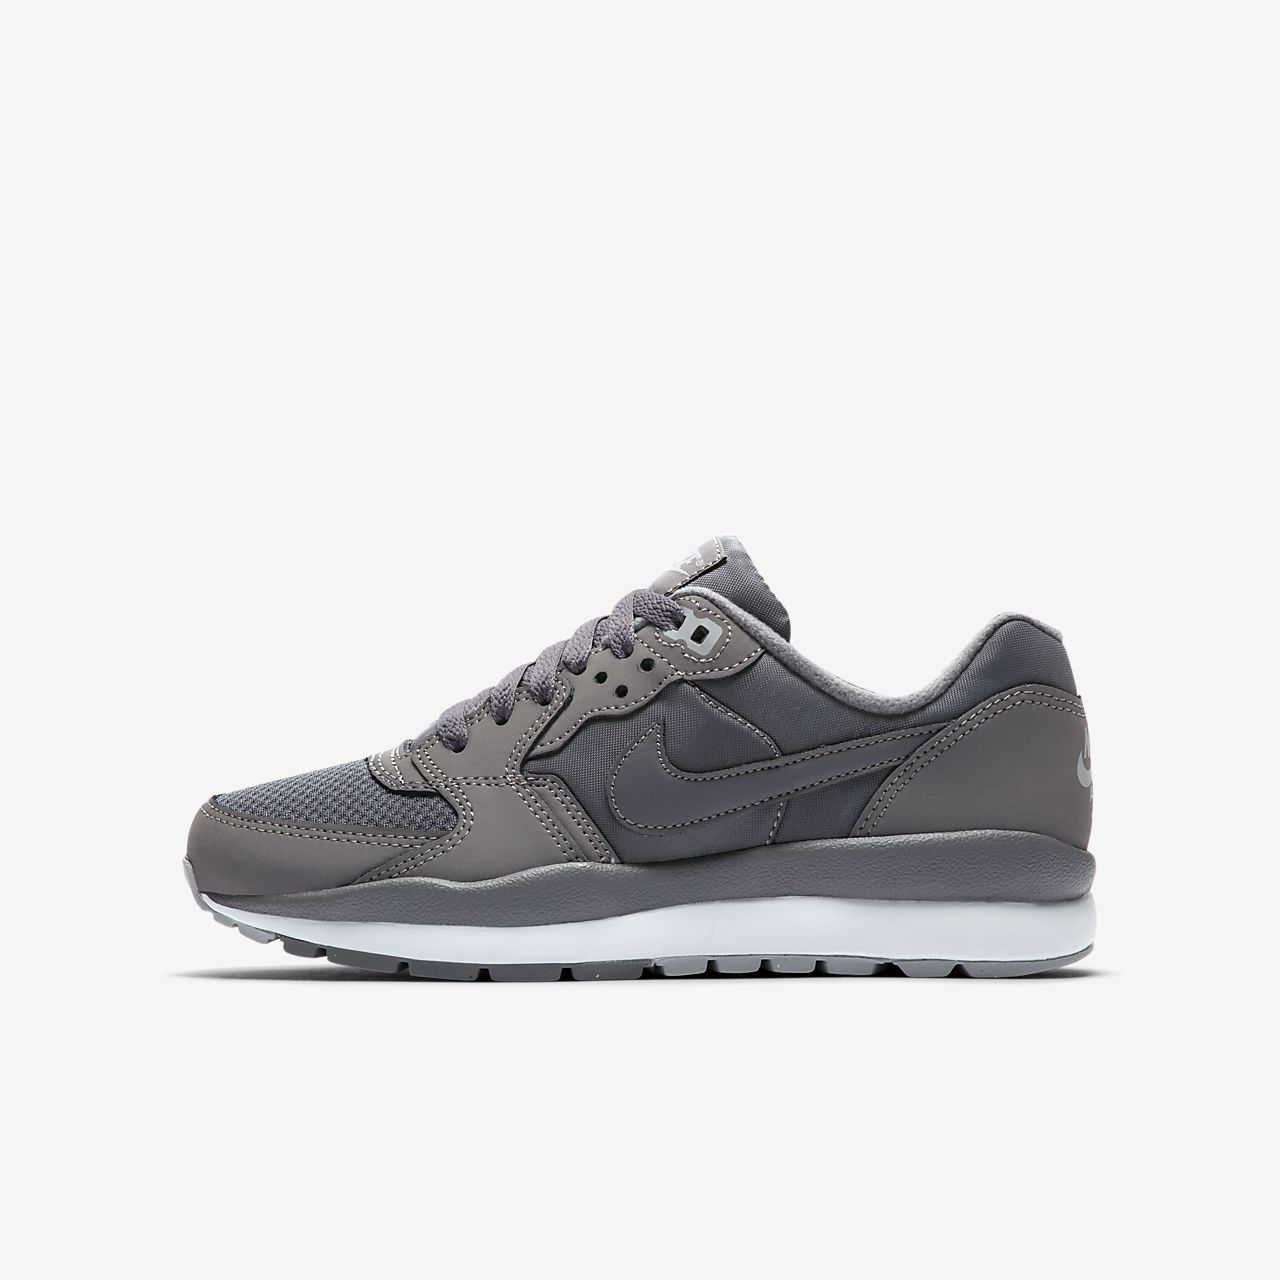 Nike De Air 2 Running Es Niño Windrunner Zapatillas Tr rxr4Safn 945a5a64be3ef